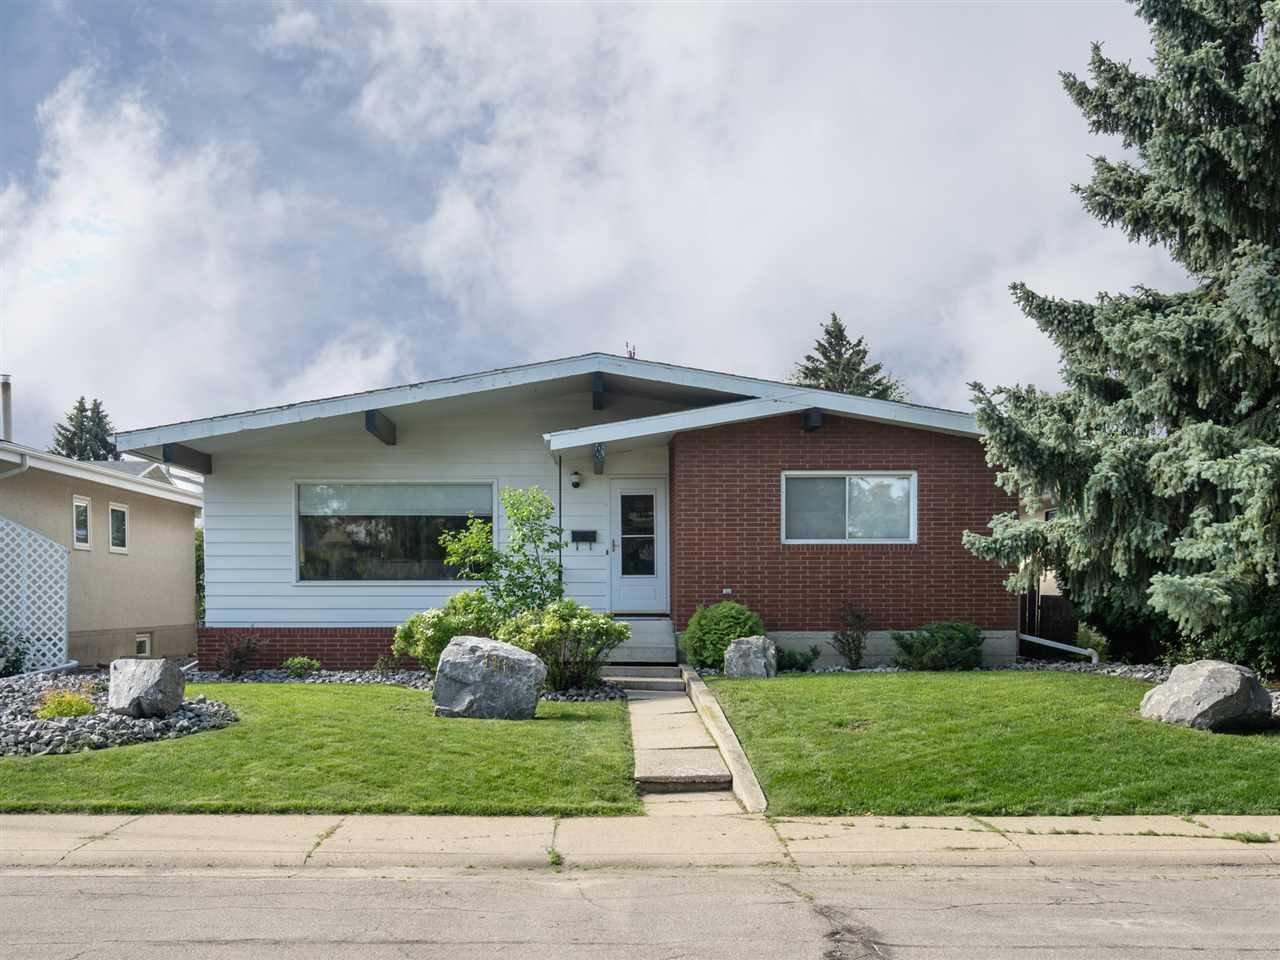 Main Photo: 11111 36 Avenue in Edmonton: Zone 16 House for sale : MLS®# E4163644